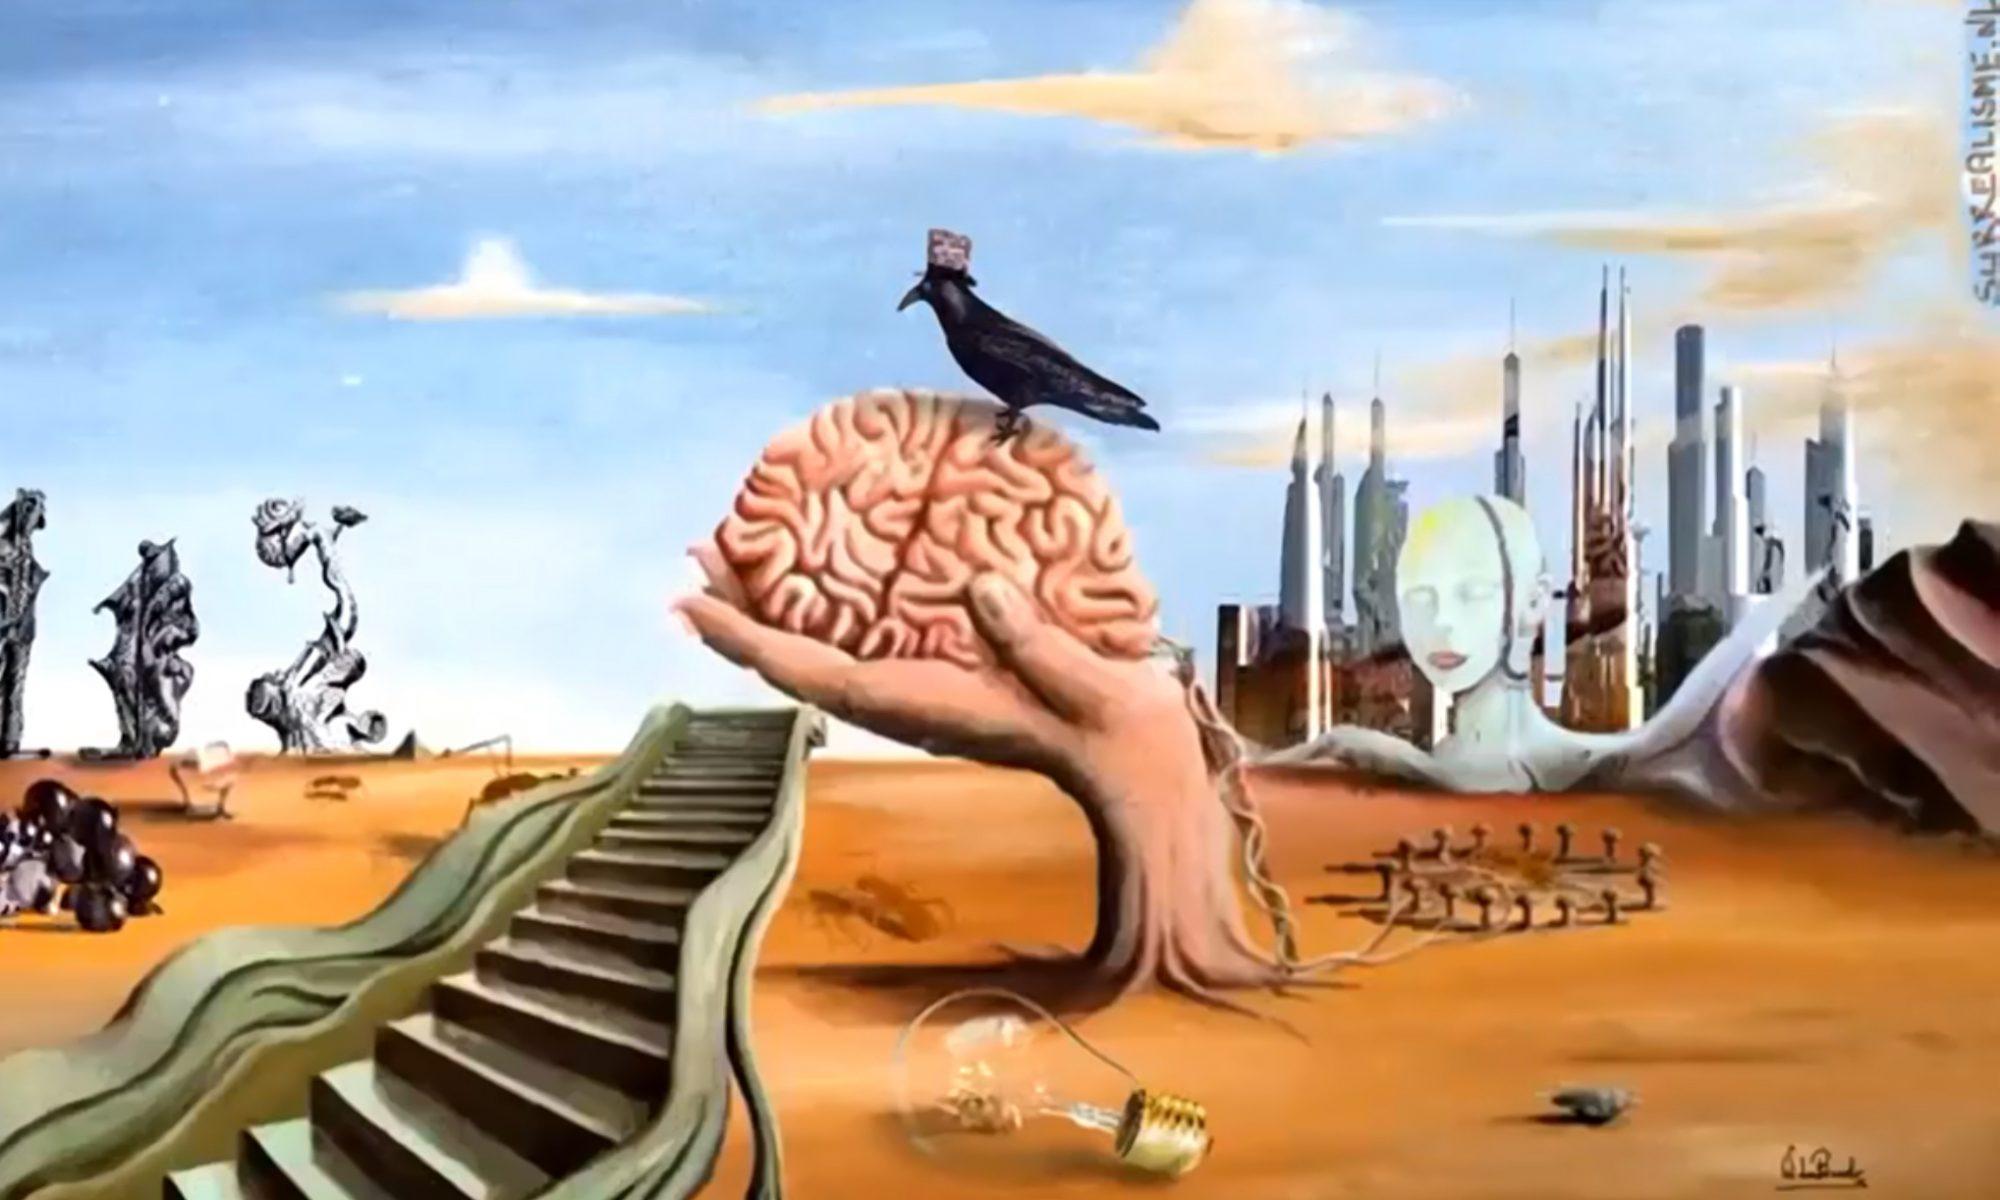 Surrealisme - Wikipedia